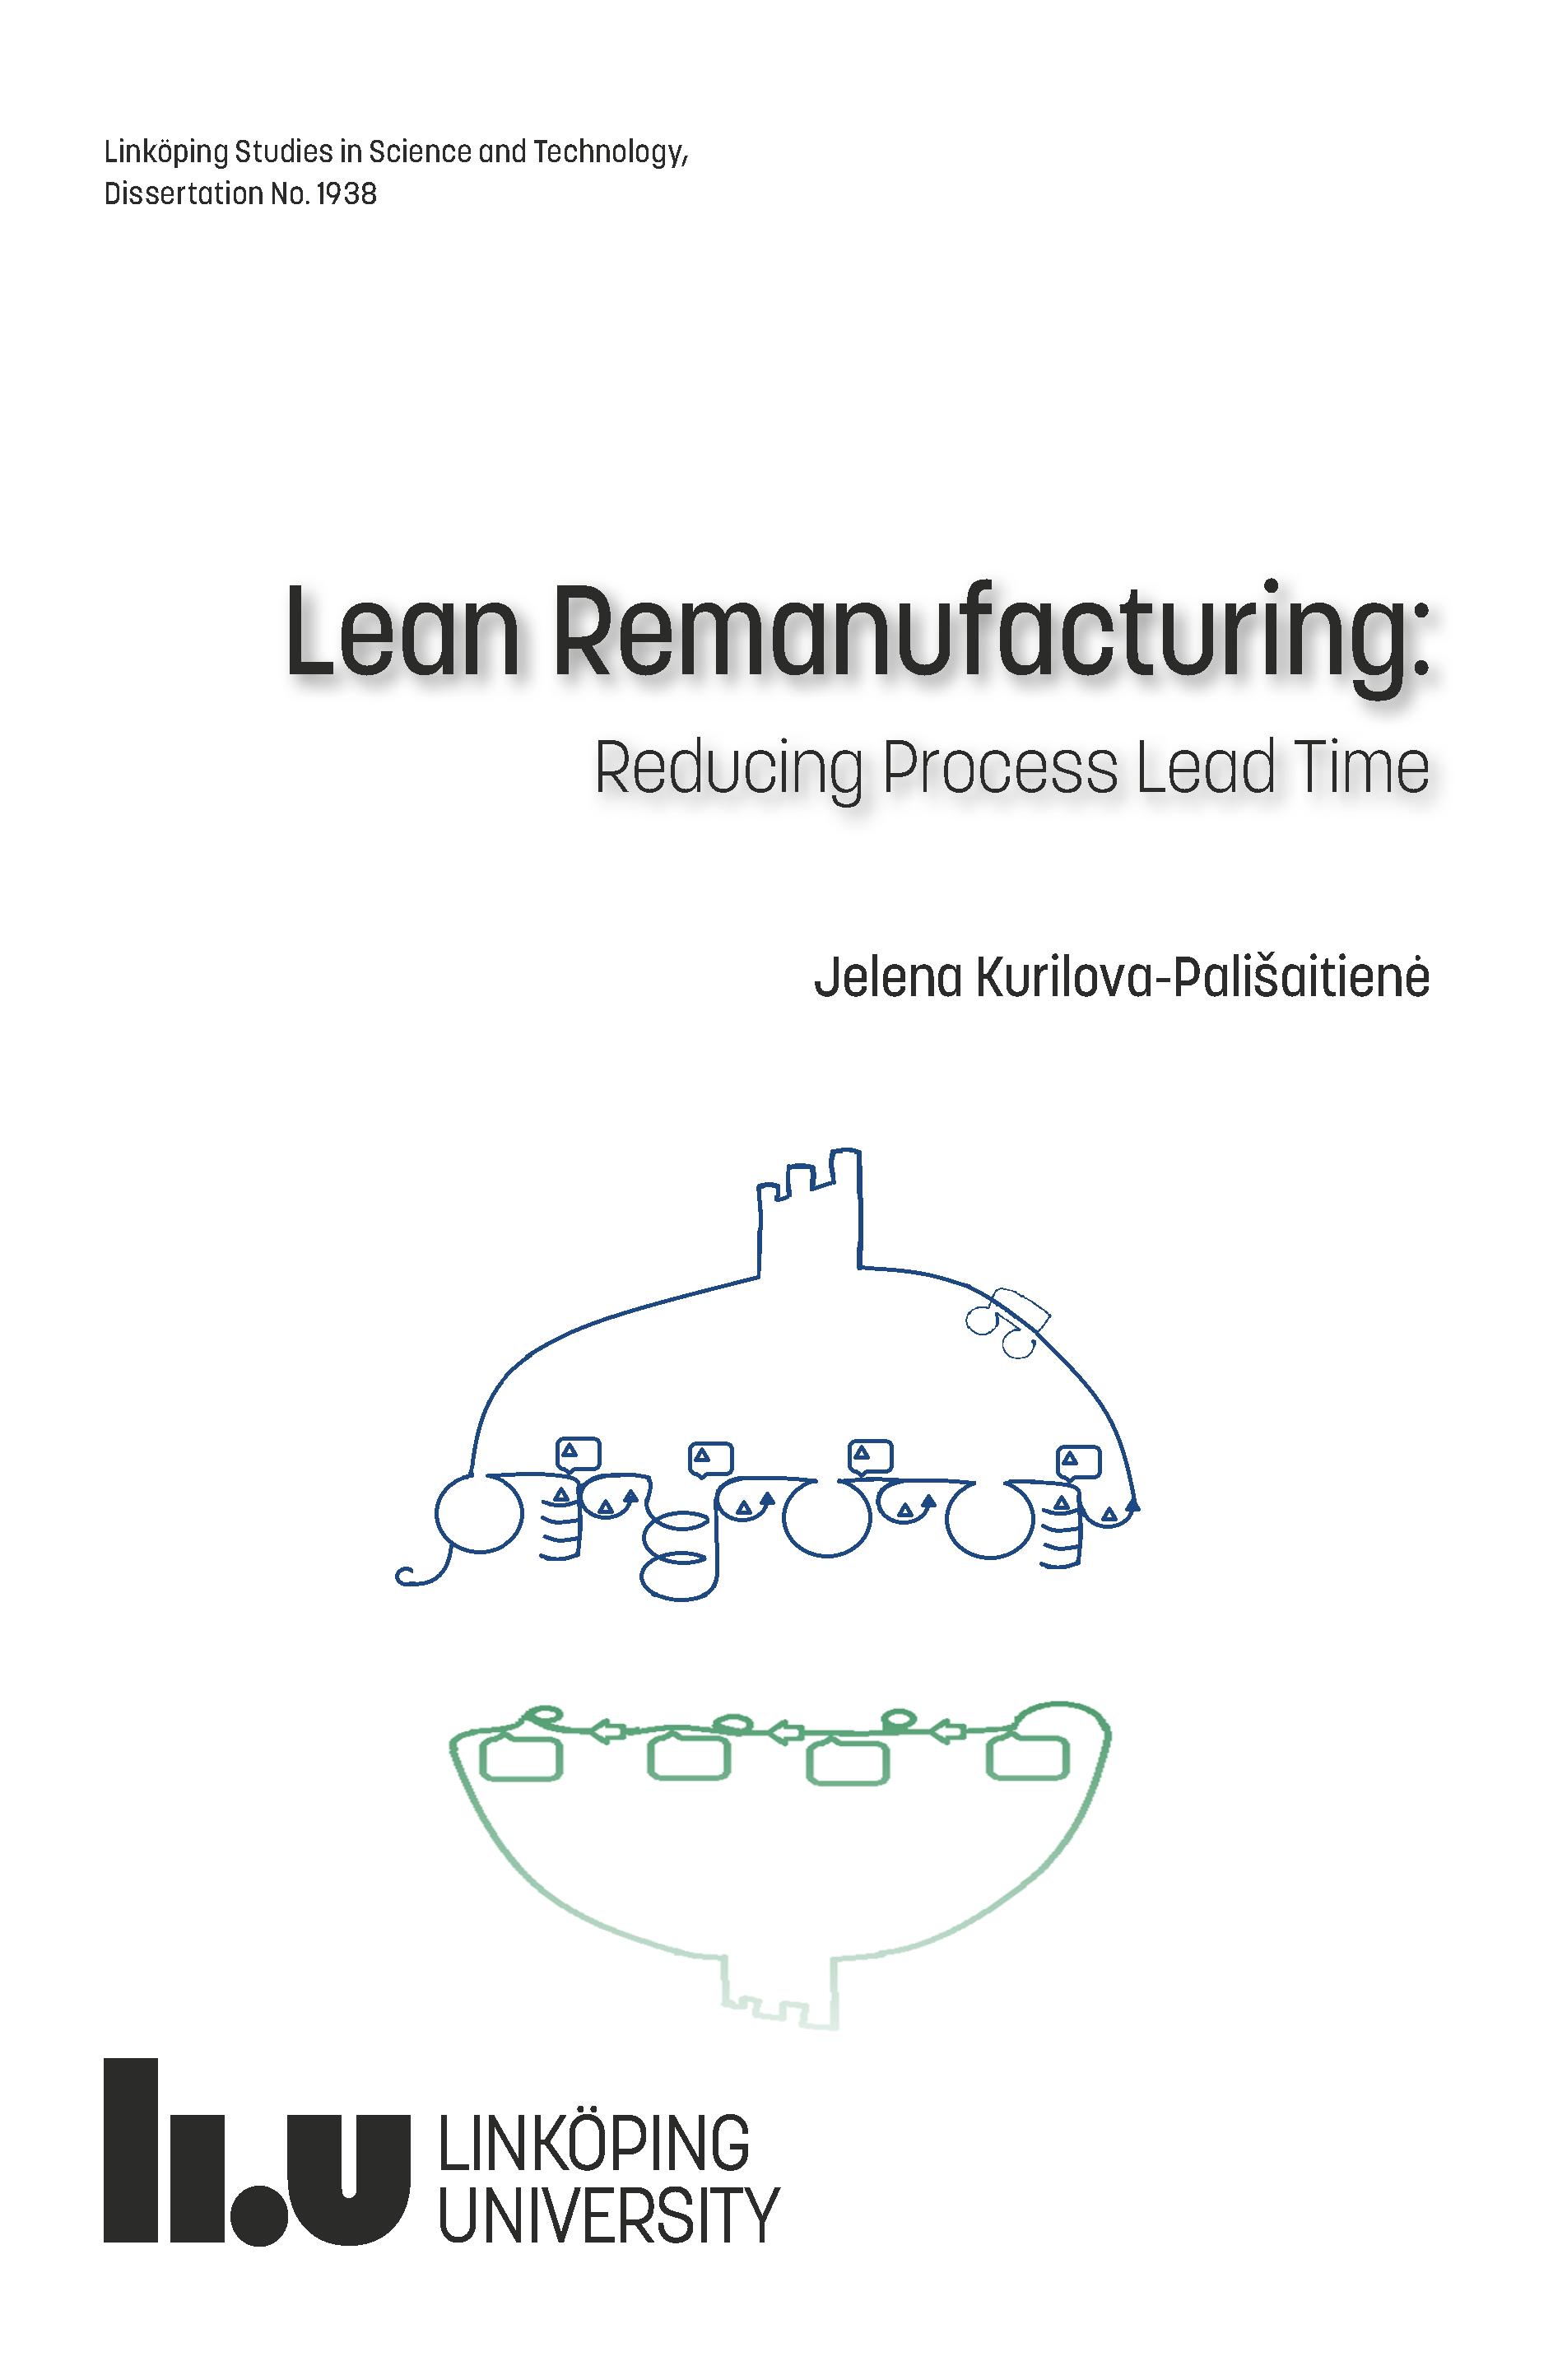 proces lead time